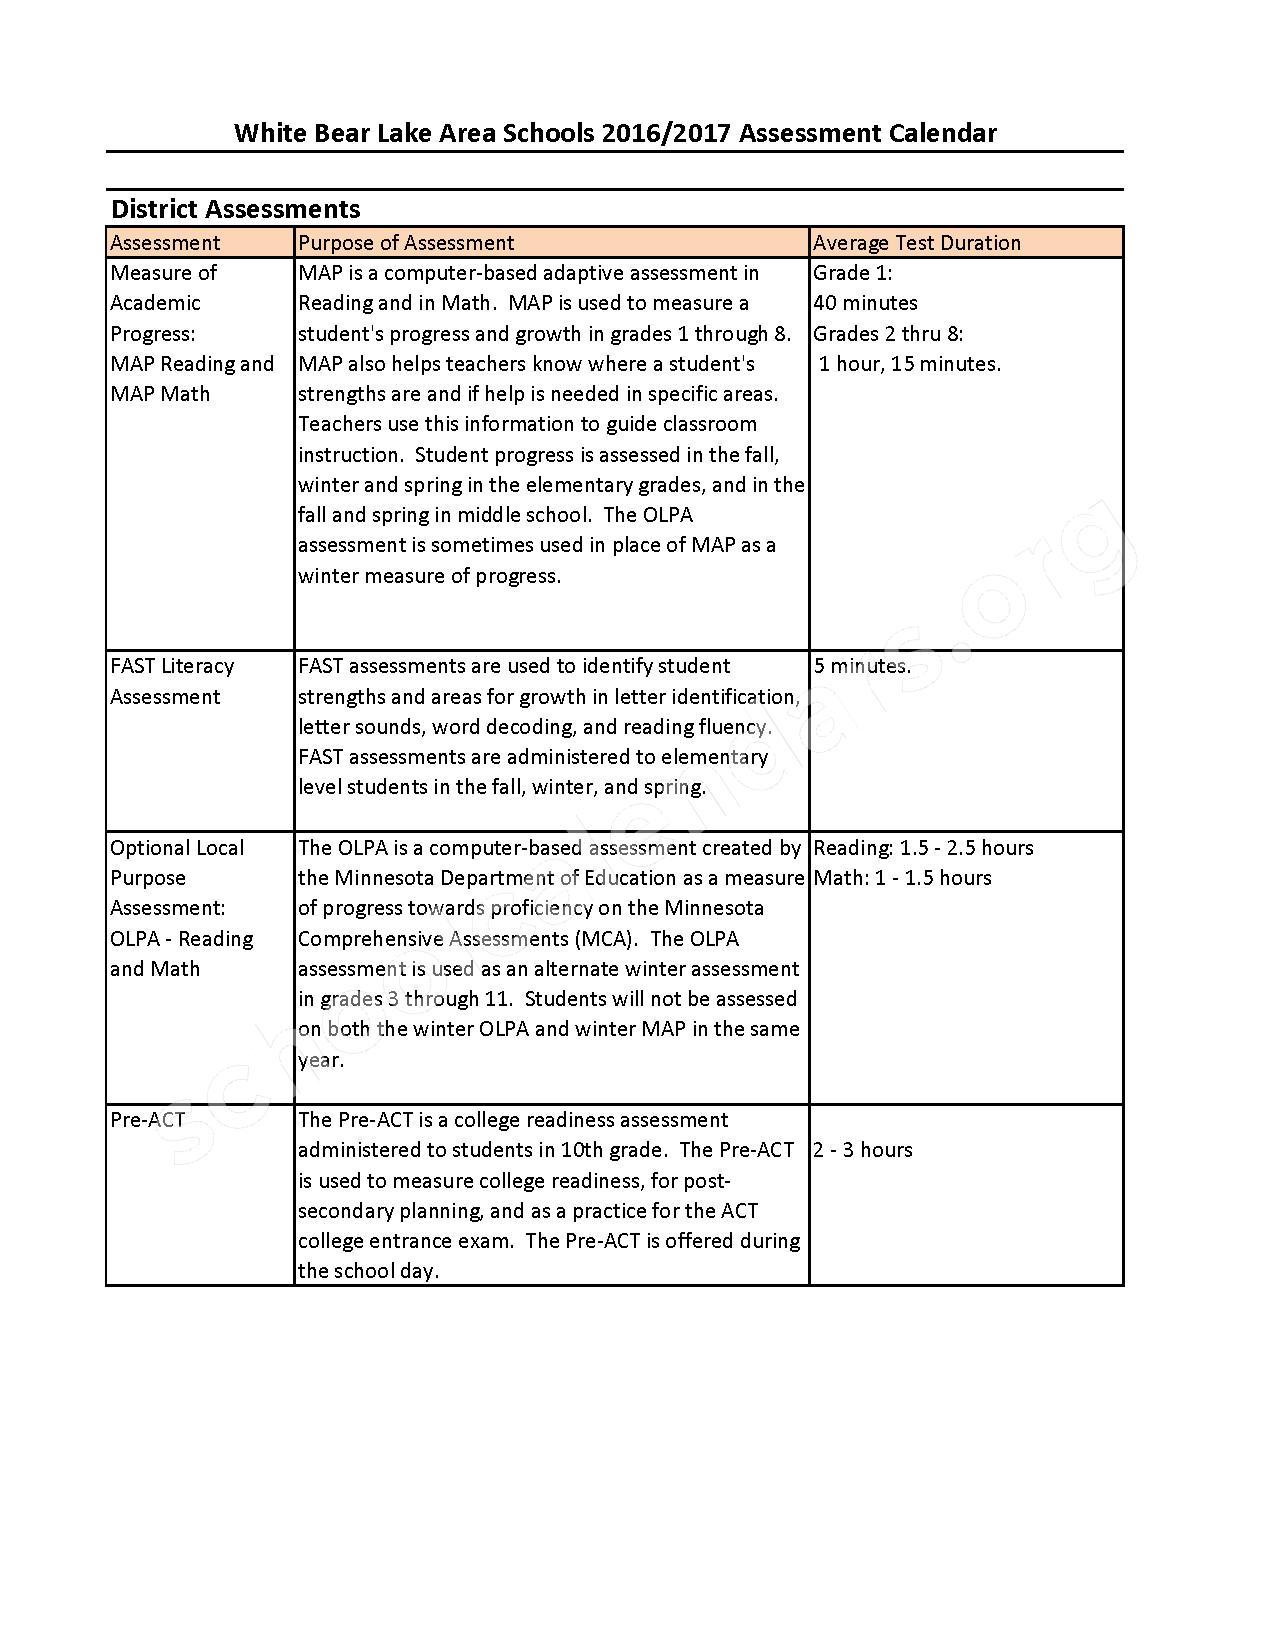 2016 - 2017 District Assessment Calendar – White Bear Lake School District – page 2